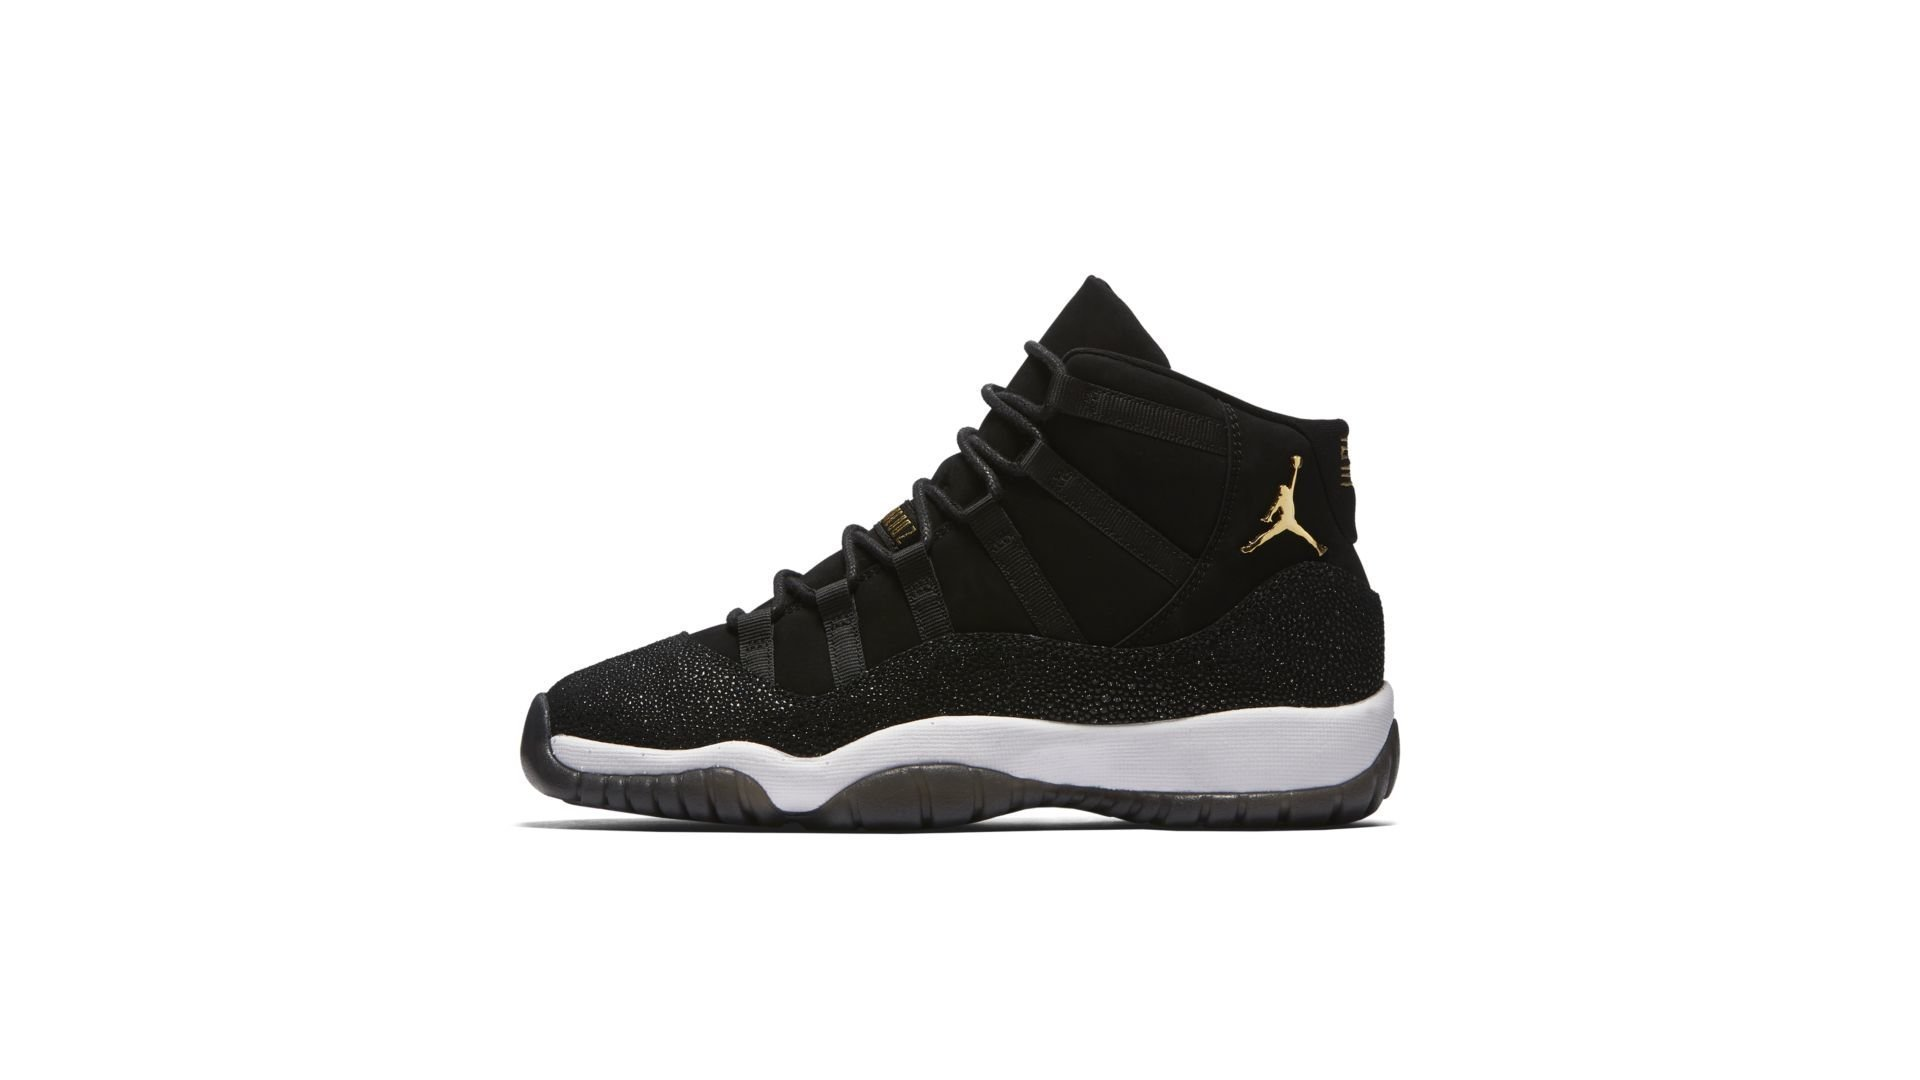 Jordan 11 Retro Heiress Black Stingray (GS) (852625-030)